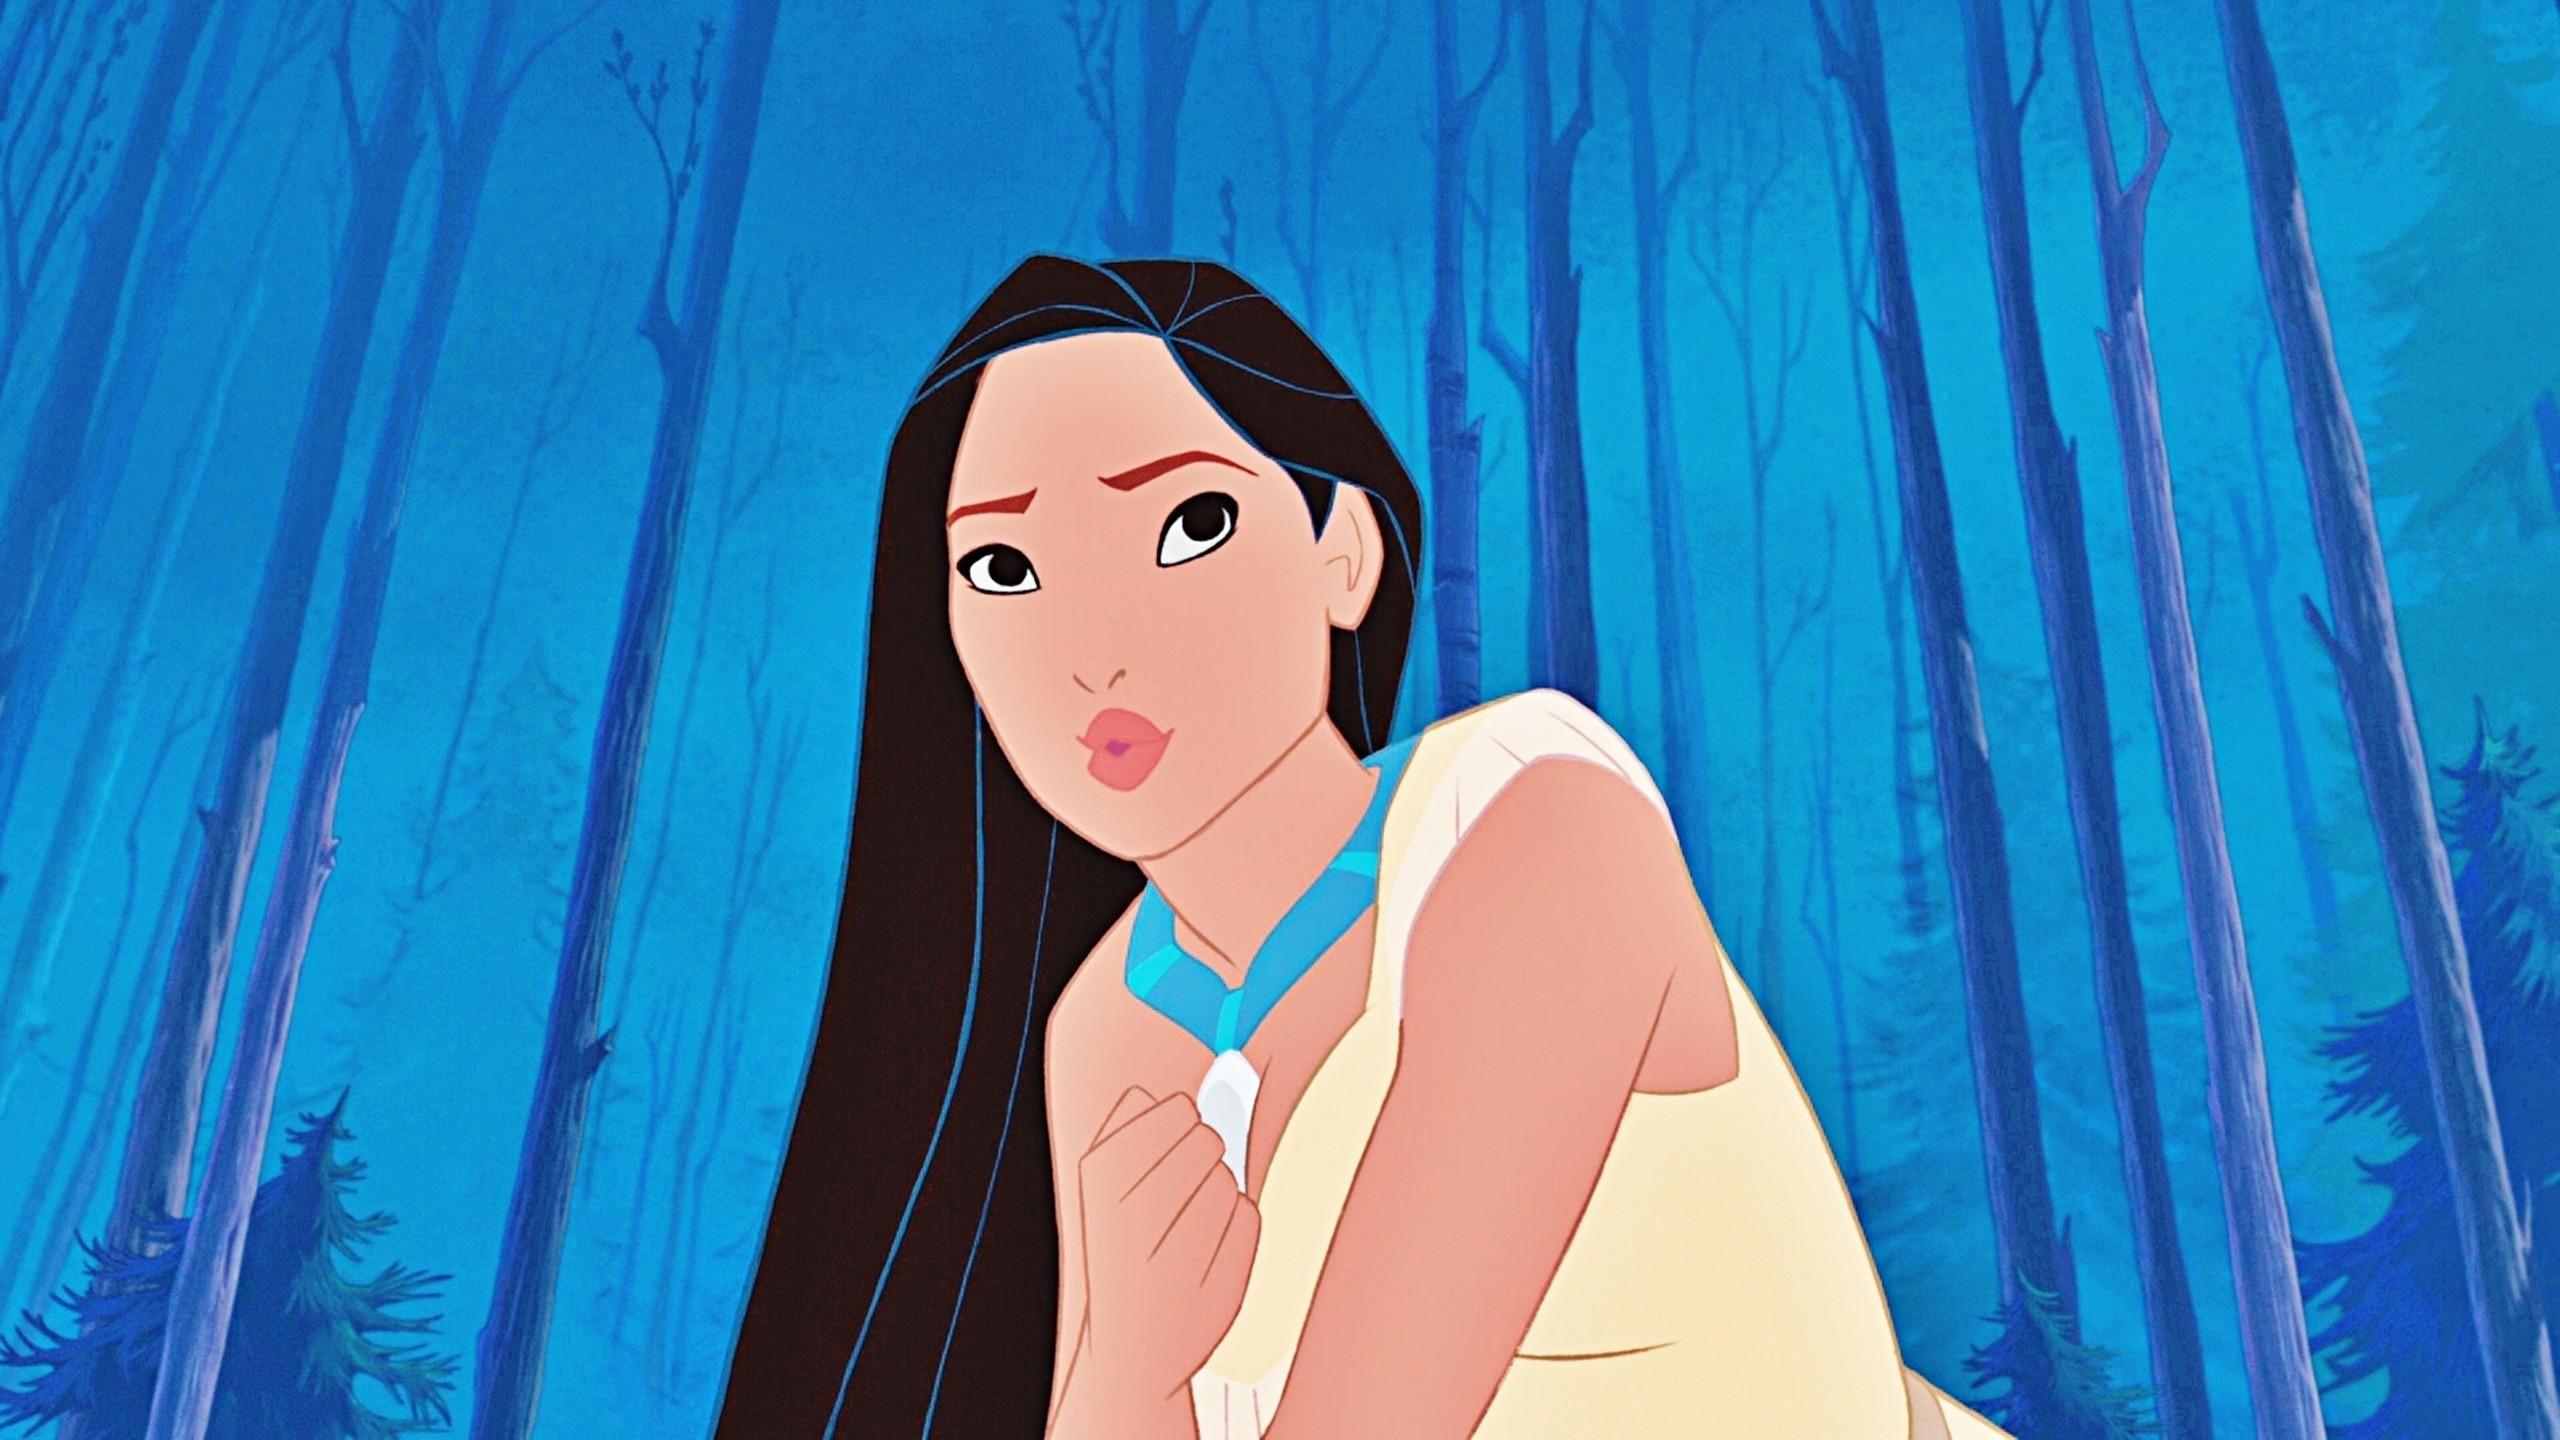 Res: 2560x1440, Pocahontas